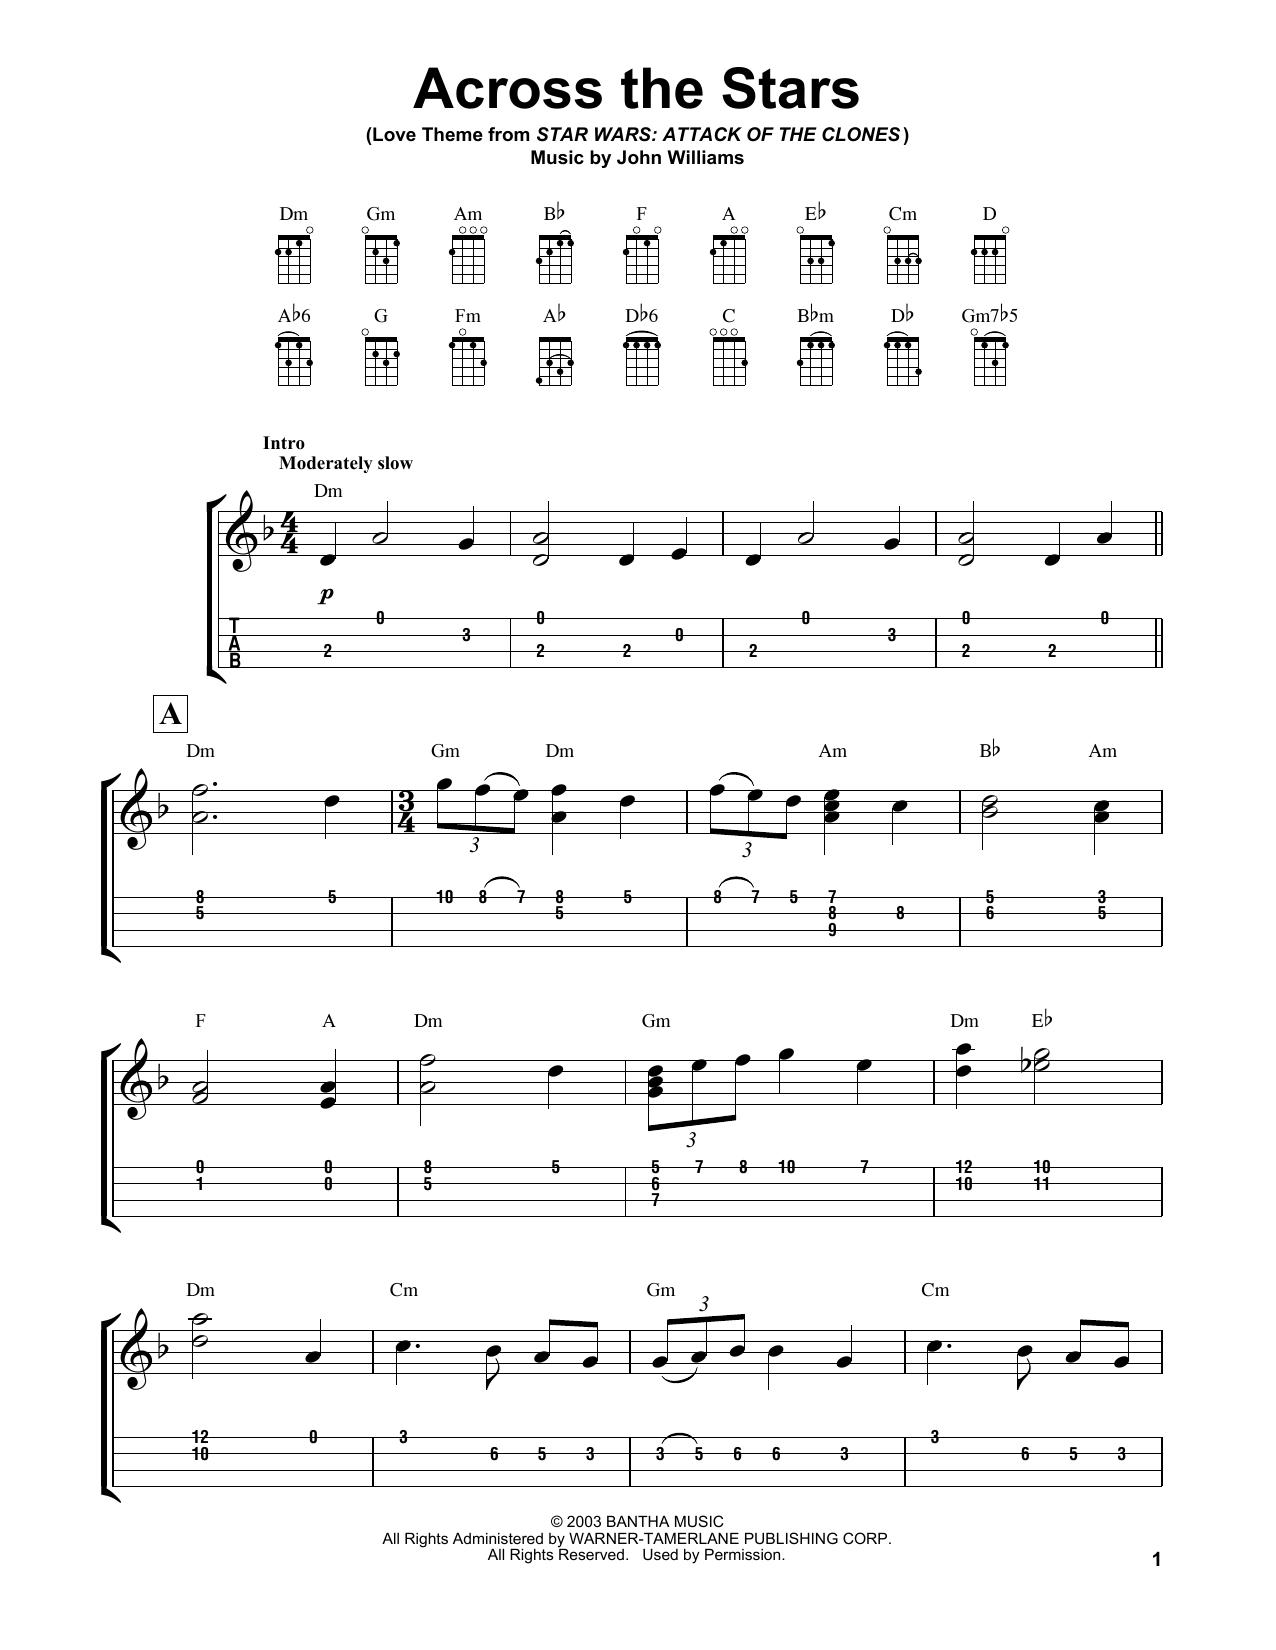 Across The Stars by John Williams - Ukulele - Guitar